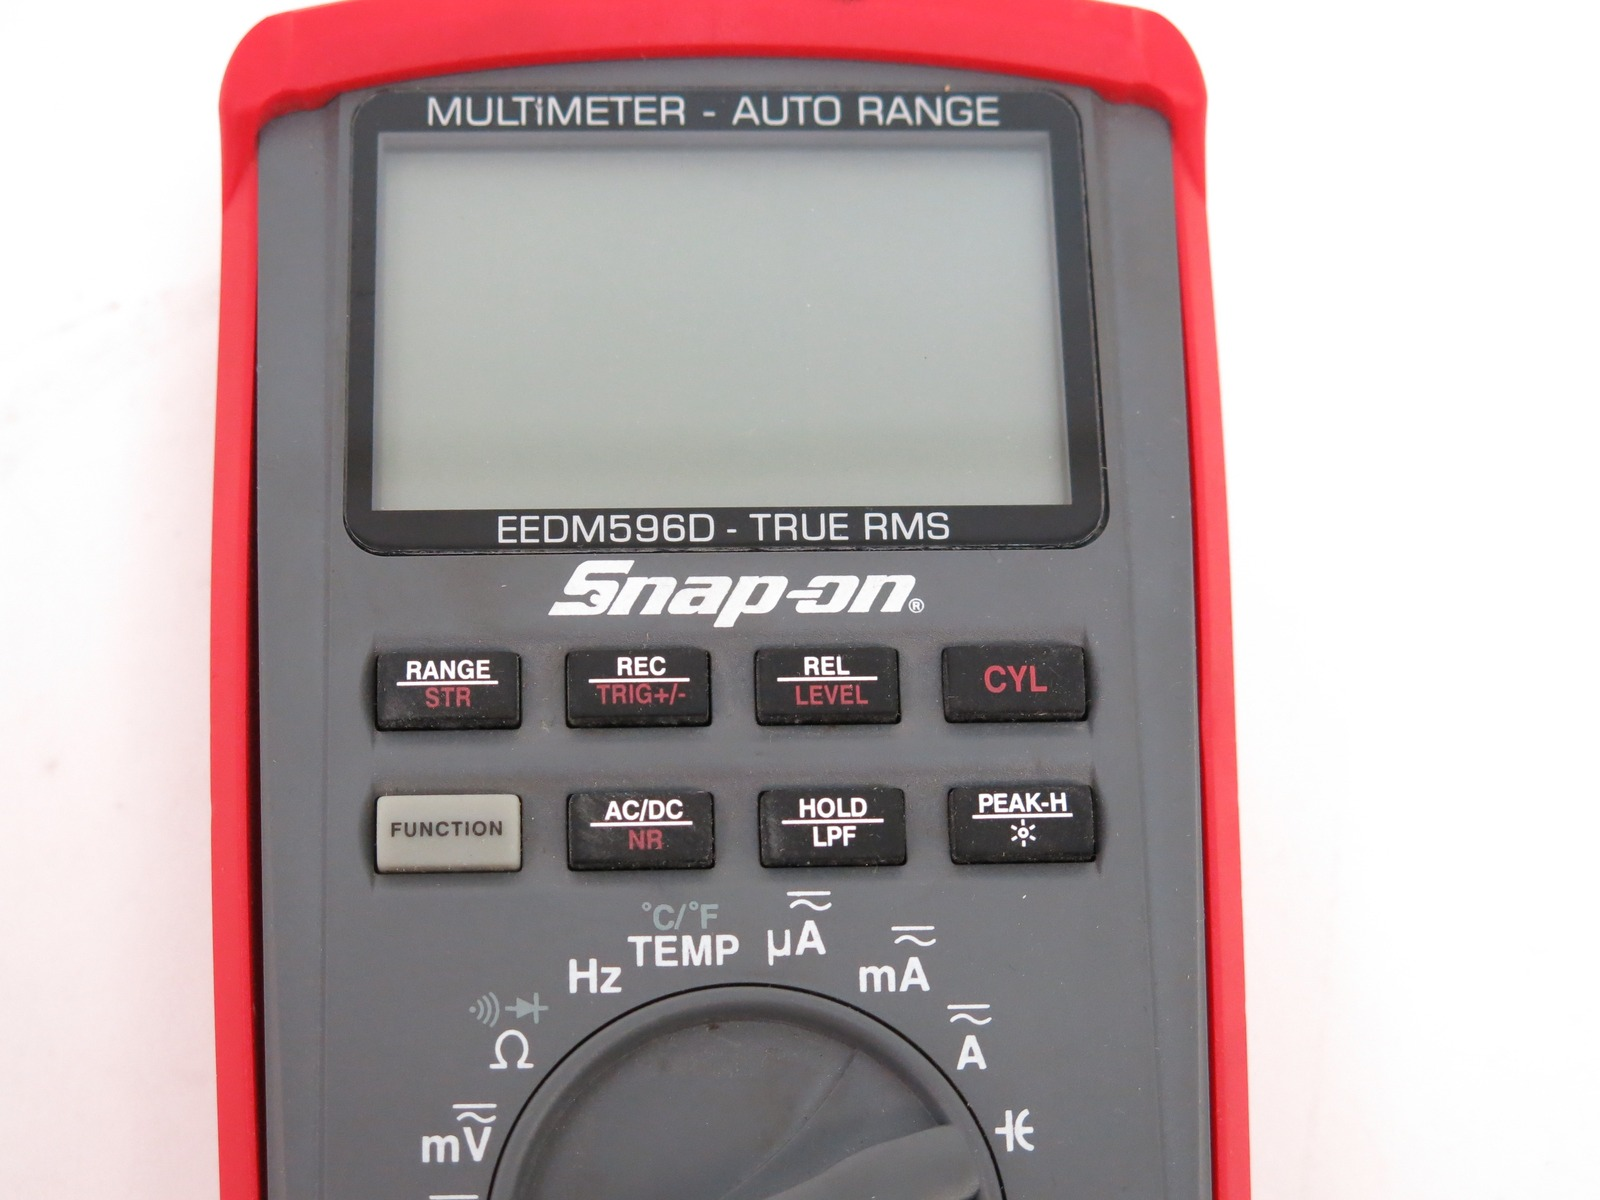 Snap On Multimeter : Snap on true rms multimeter eedm d rl ebay